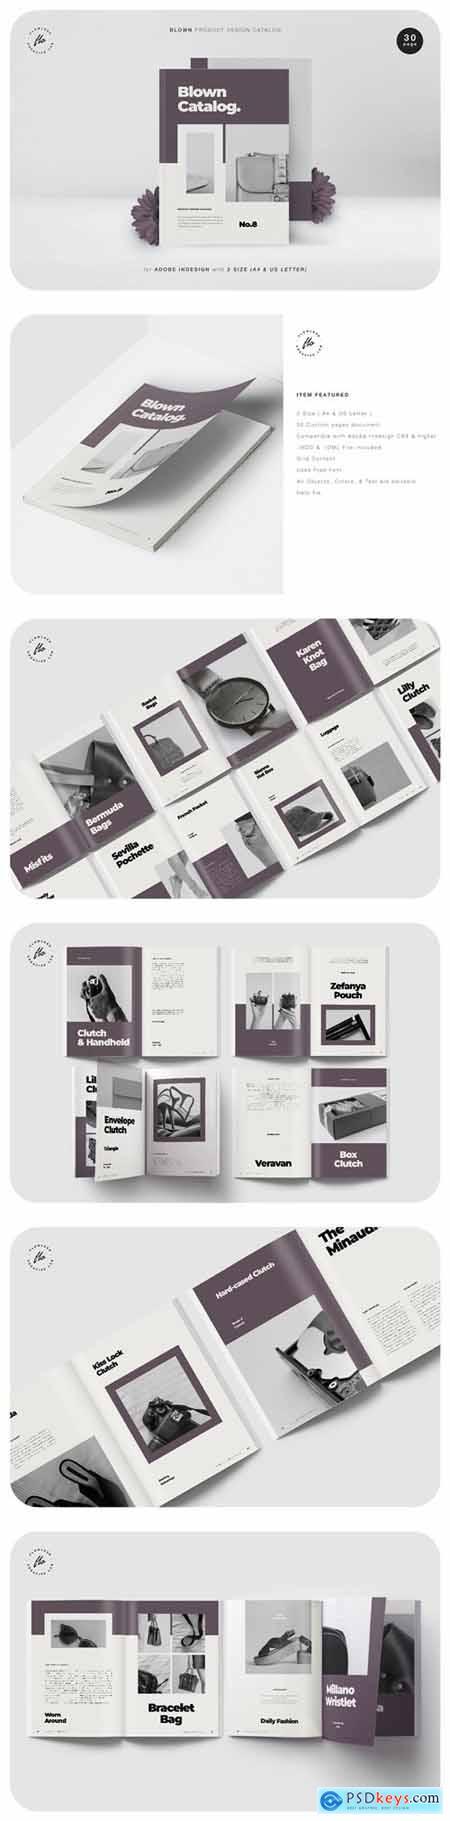 Blown Product Design Catalog